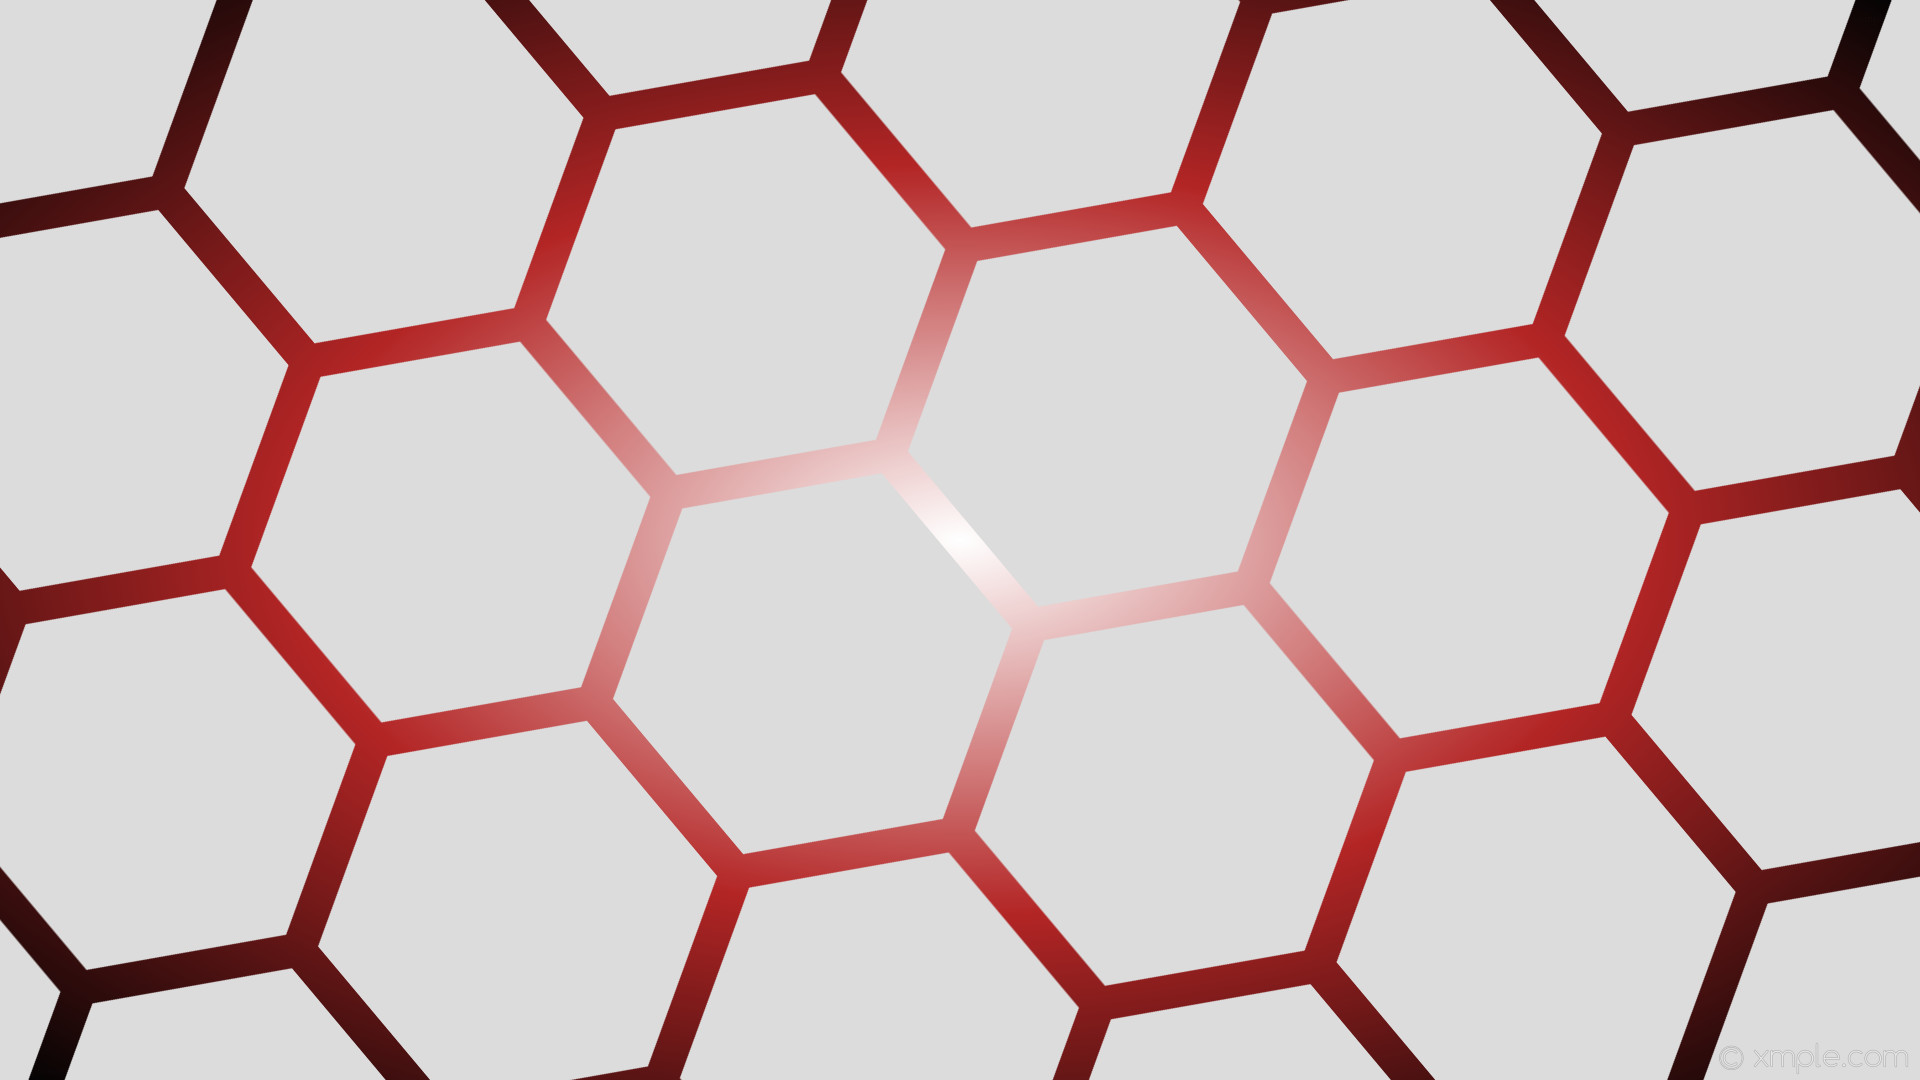 wallpaper black gradient red white grey glow hexagon #dcdcdc